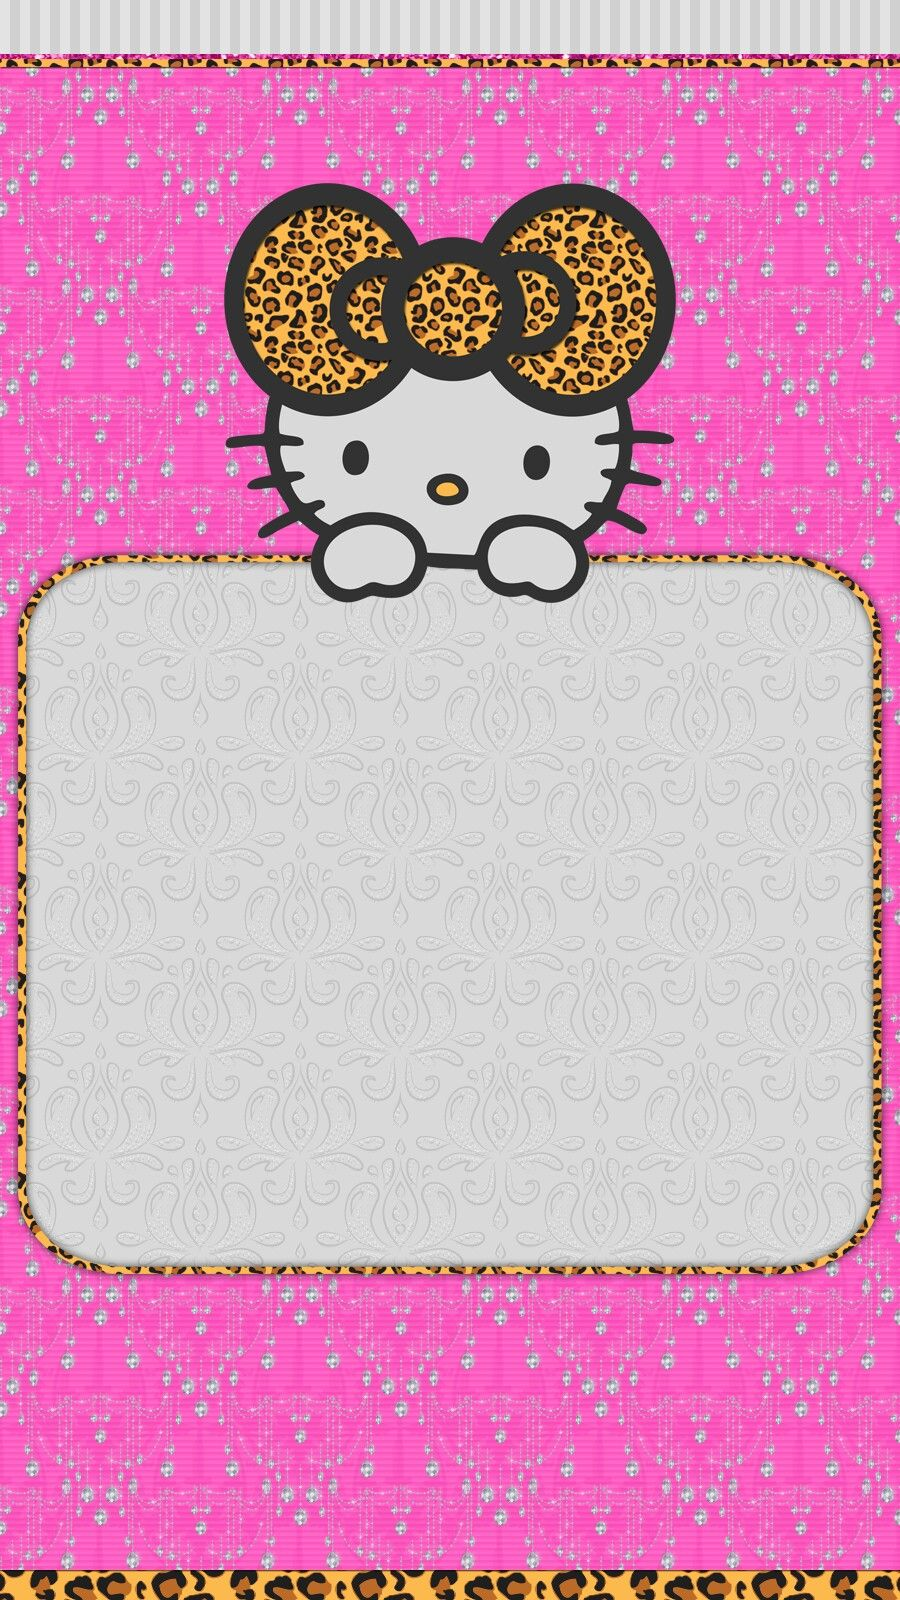 Pink Diamonds Wallpaper Iphone Hello Kitty Backgrounds